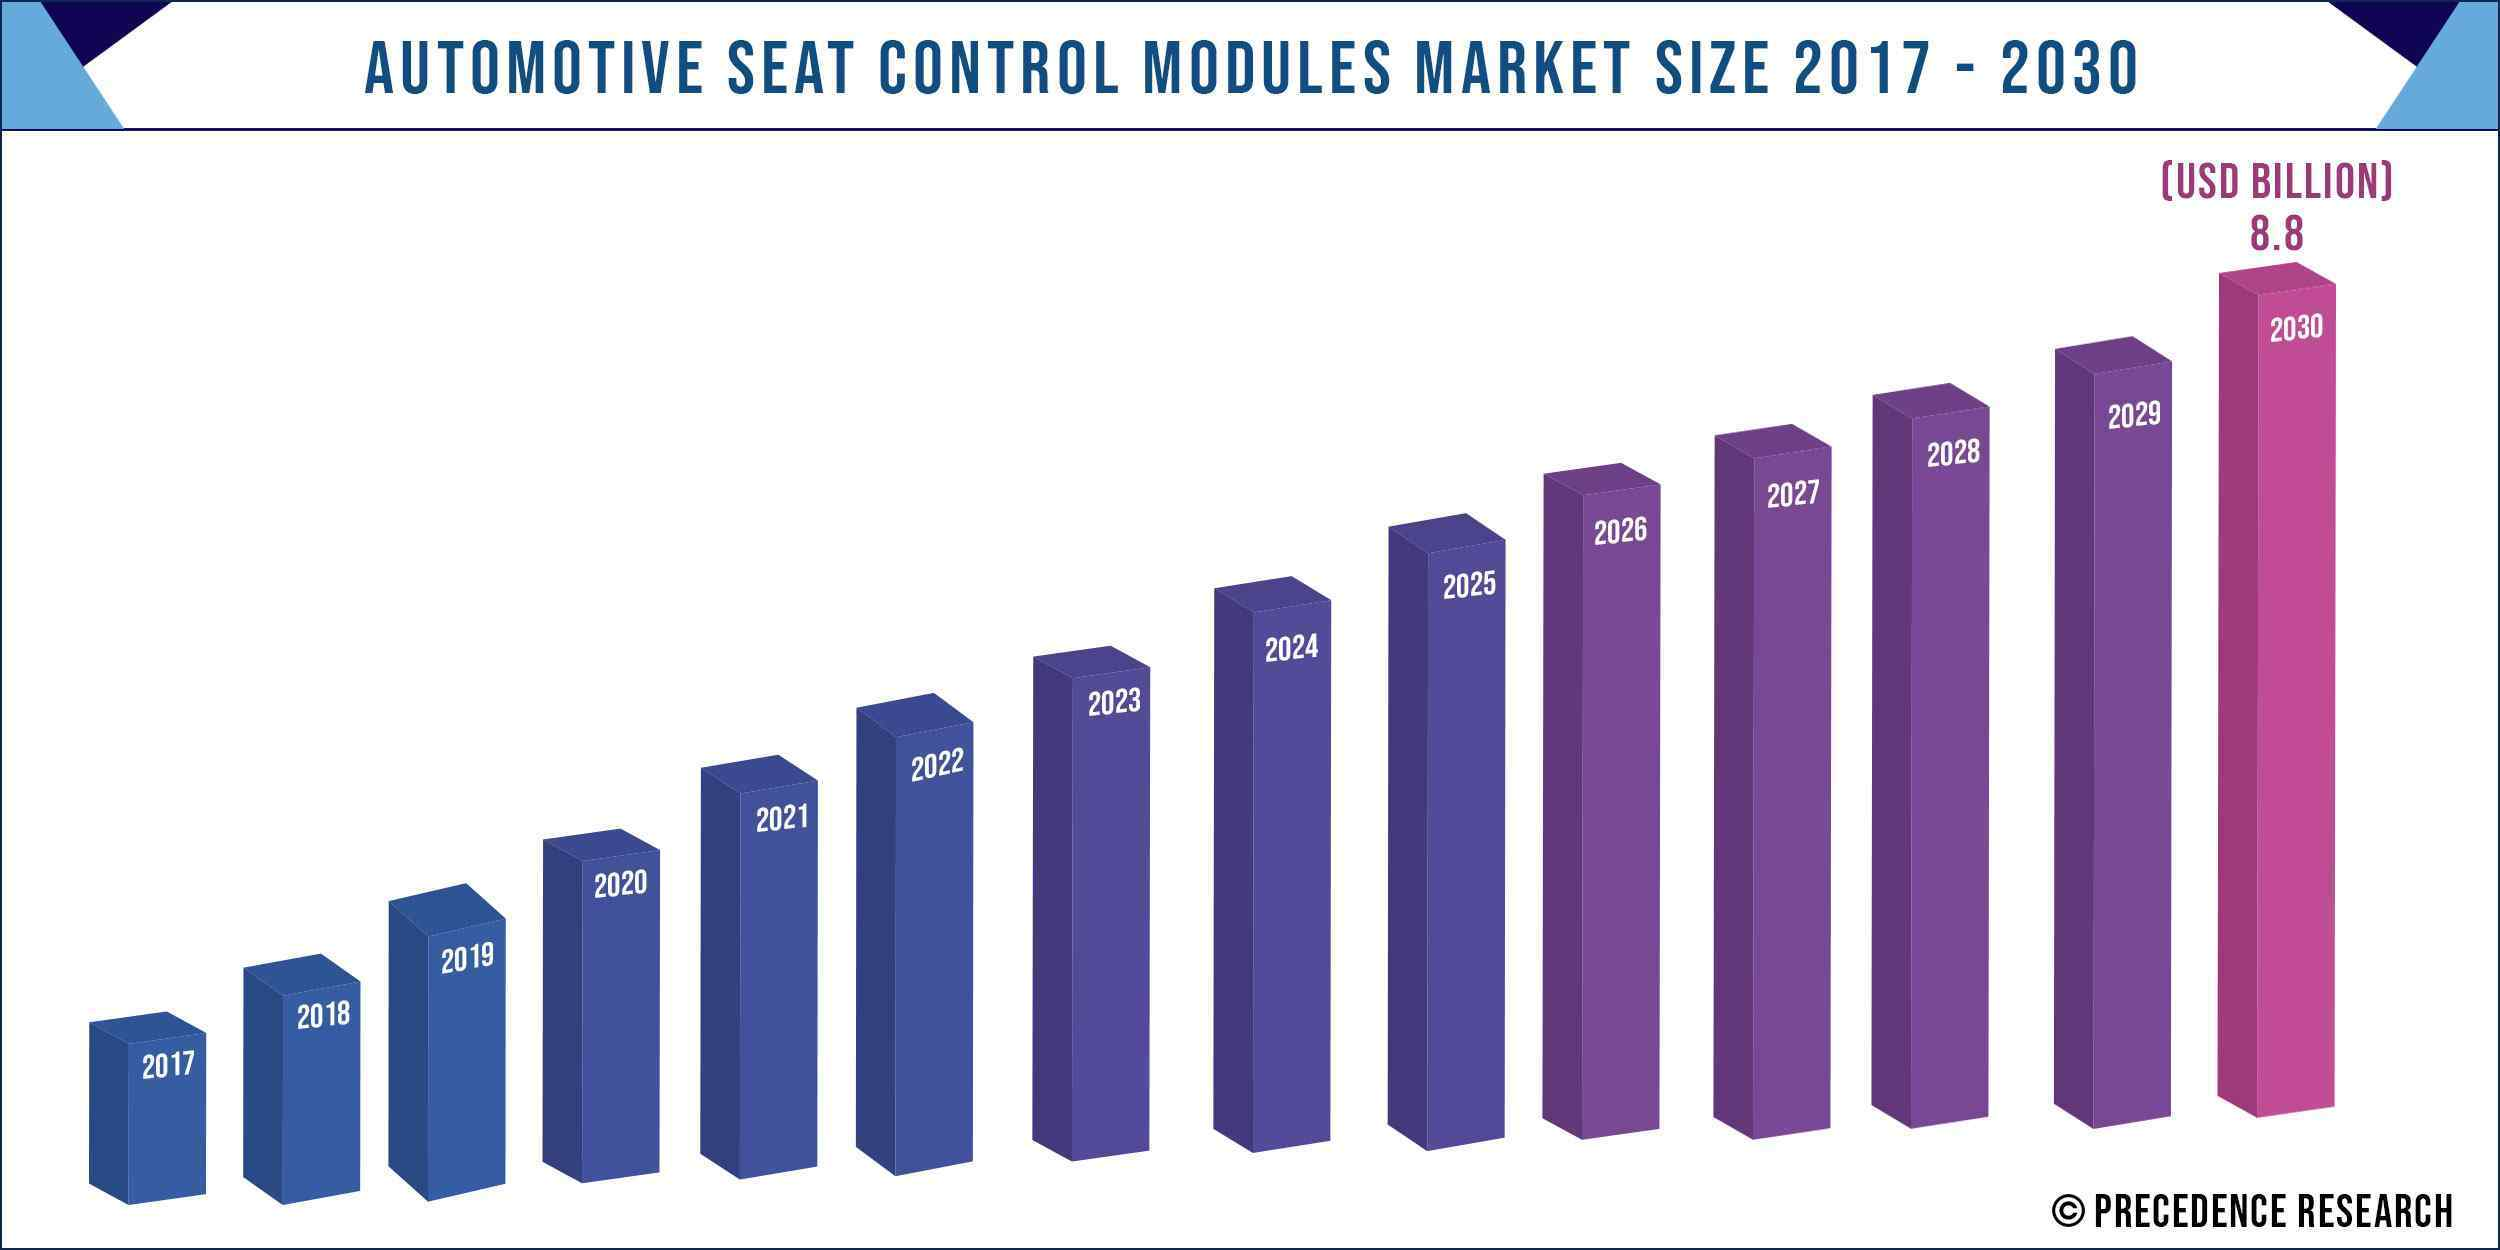 Automotive Seat Control Modules Market Size 2017-2030